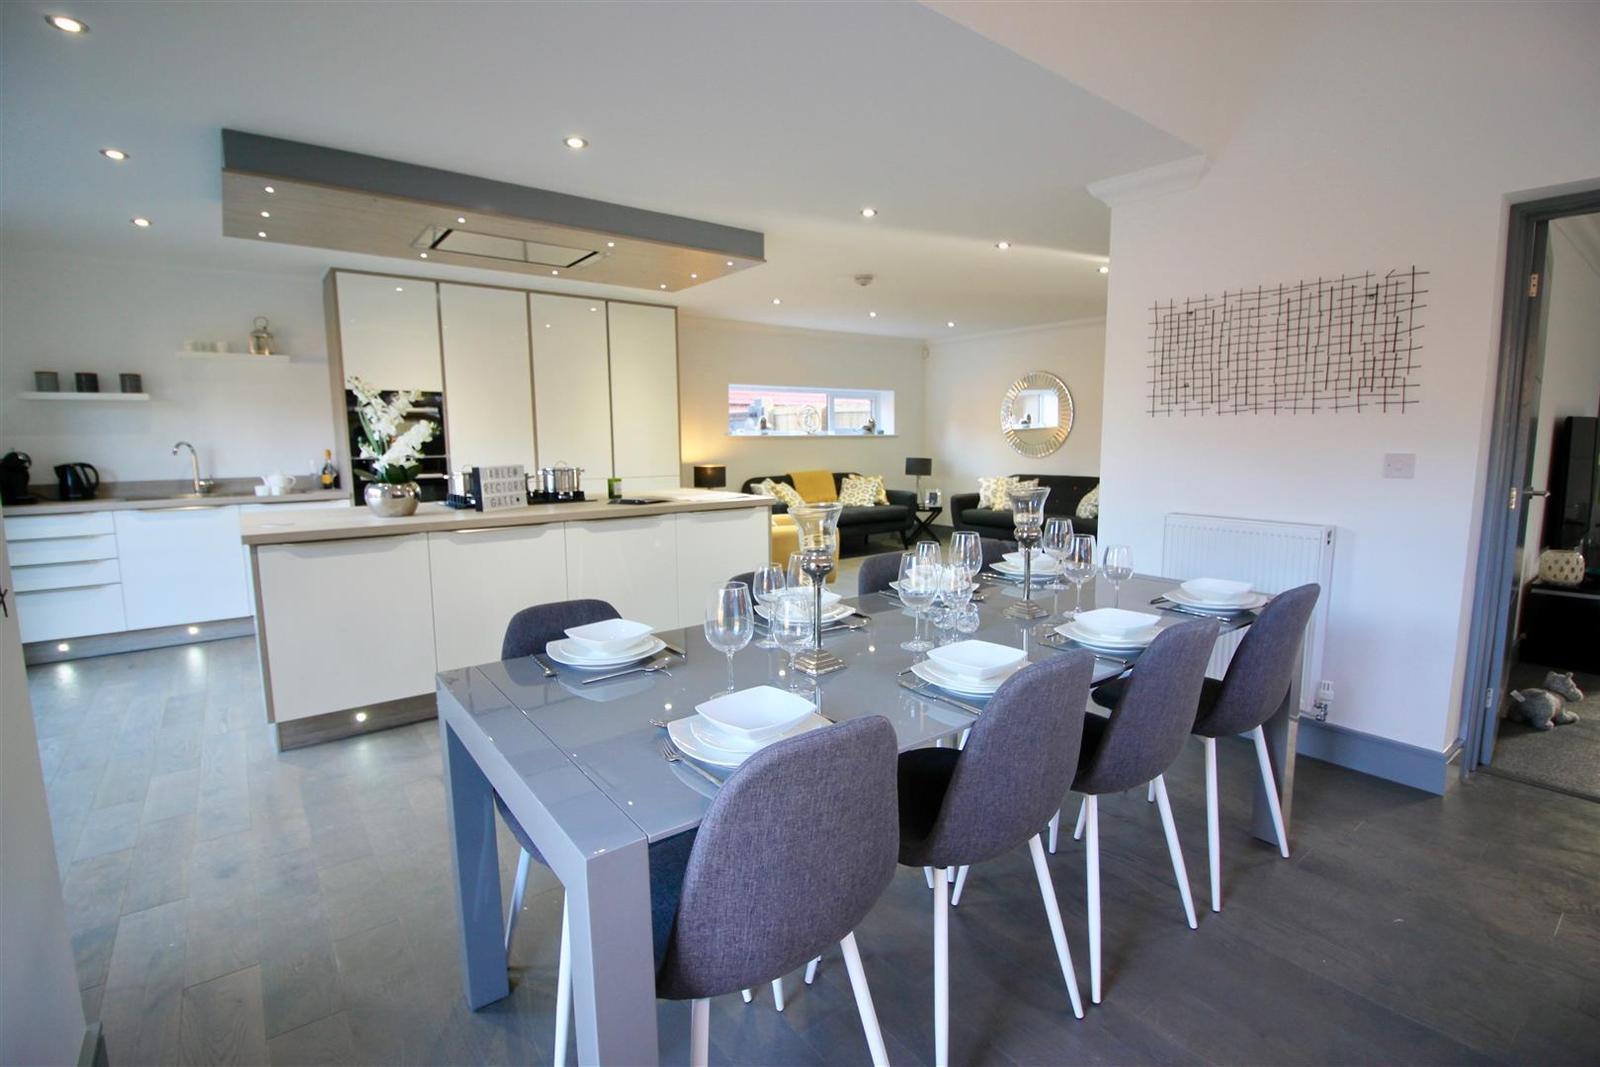 5 Bedrooms Property for sale in Rectors Gate, Retford